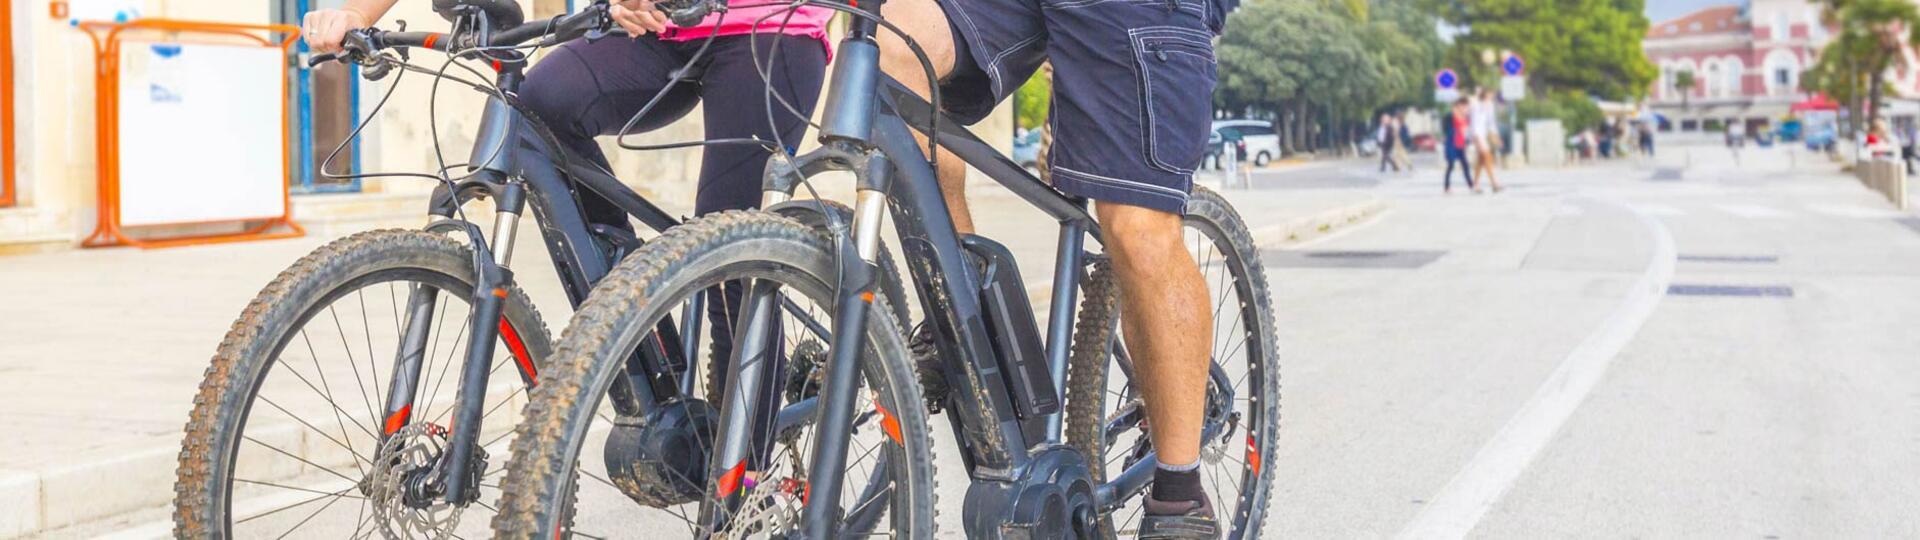 cycling.oxygenhotel de e-bike-rimini 012